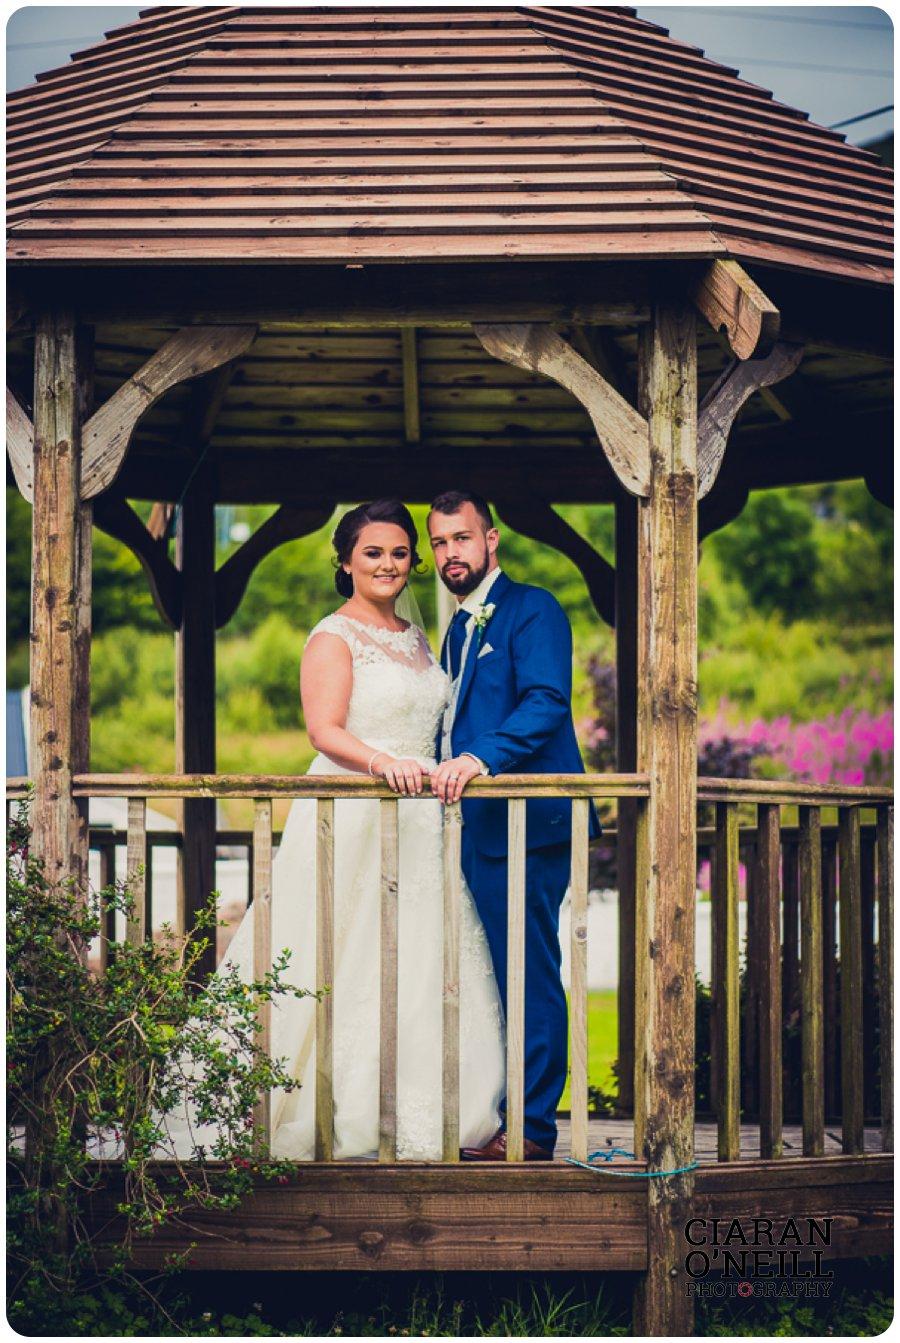 Amy & Stephen's wedding at Jacksons Ballybofey 15